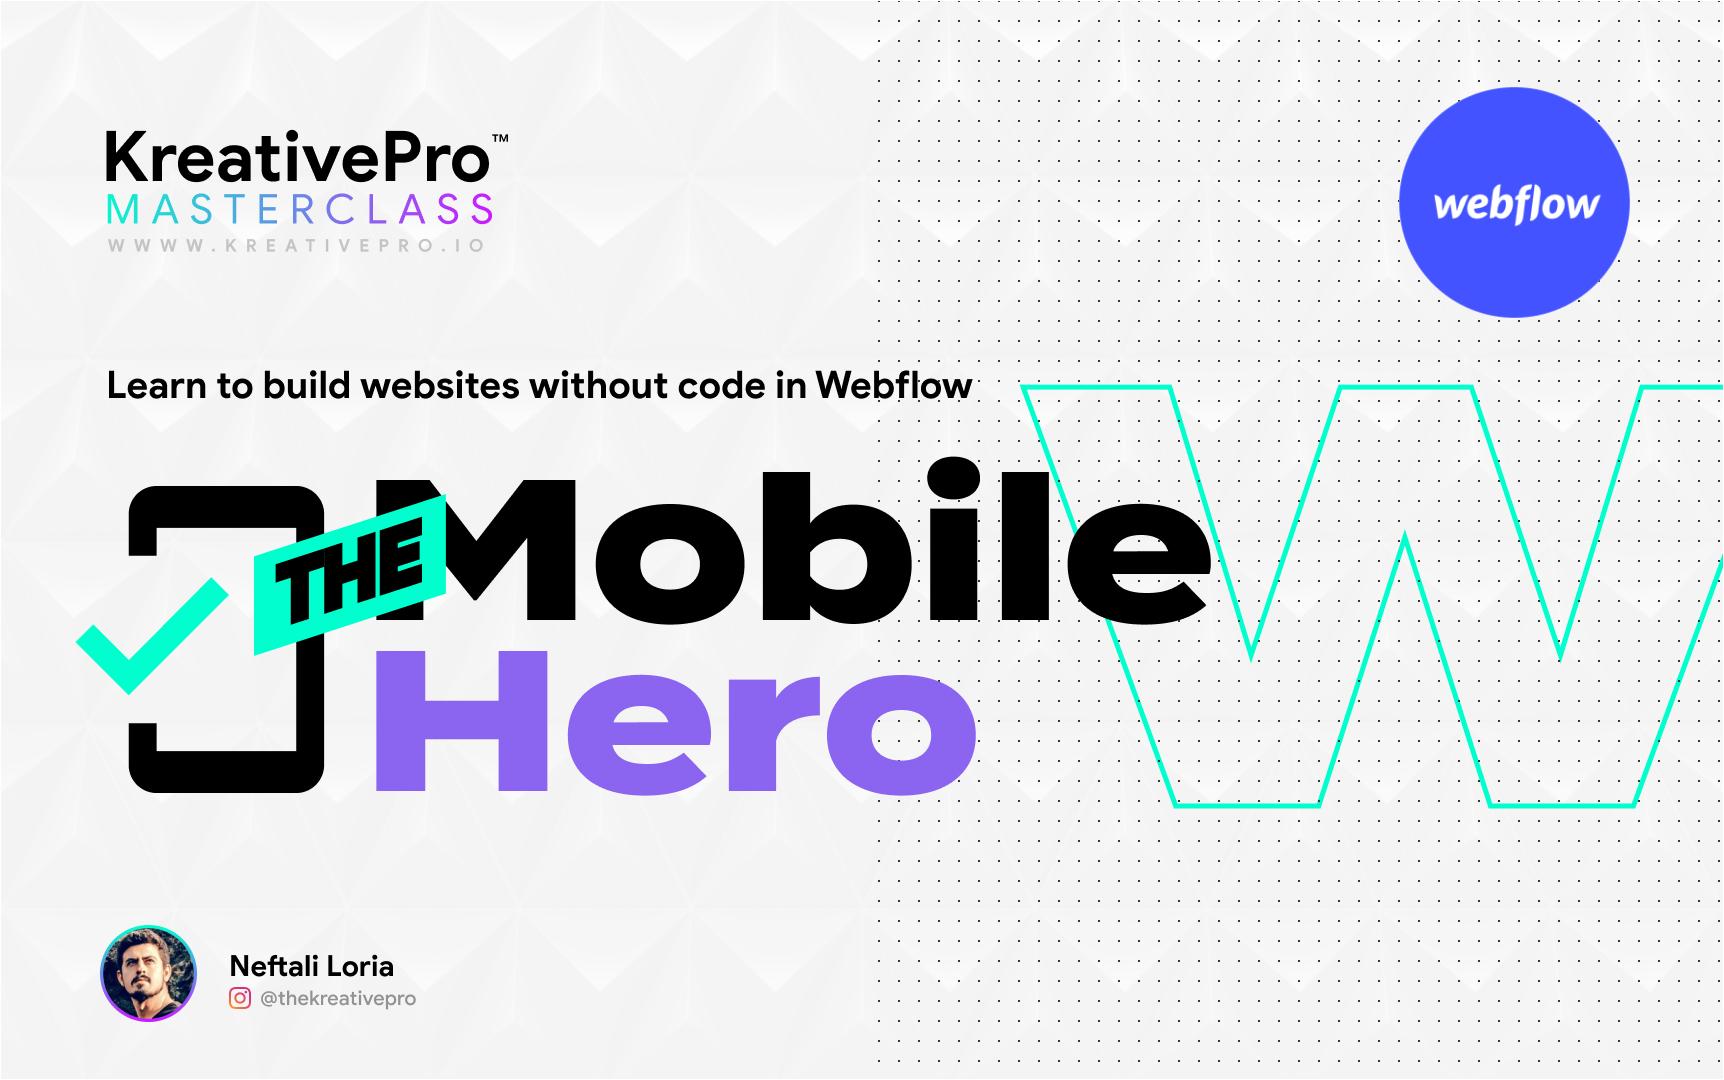 Webflow 4.2 - The Mobile Hero